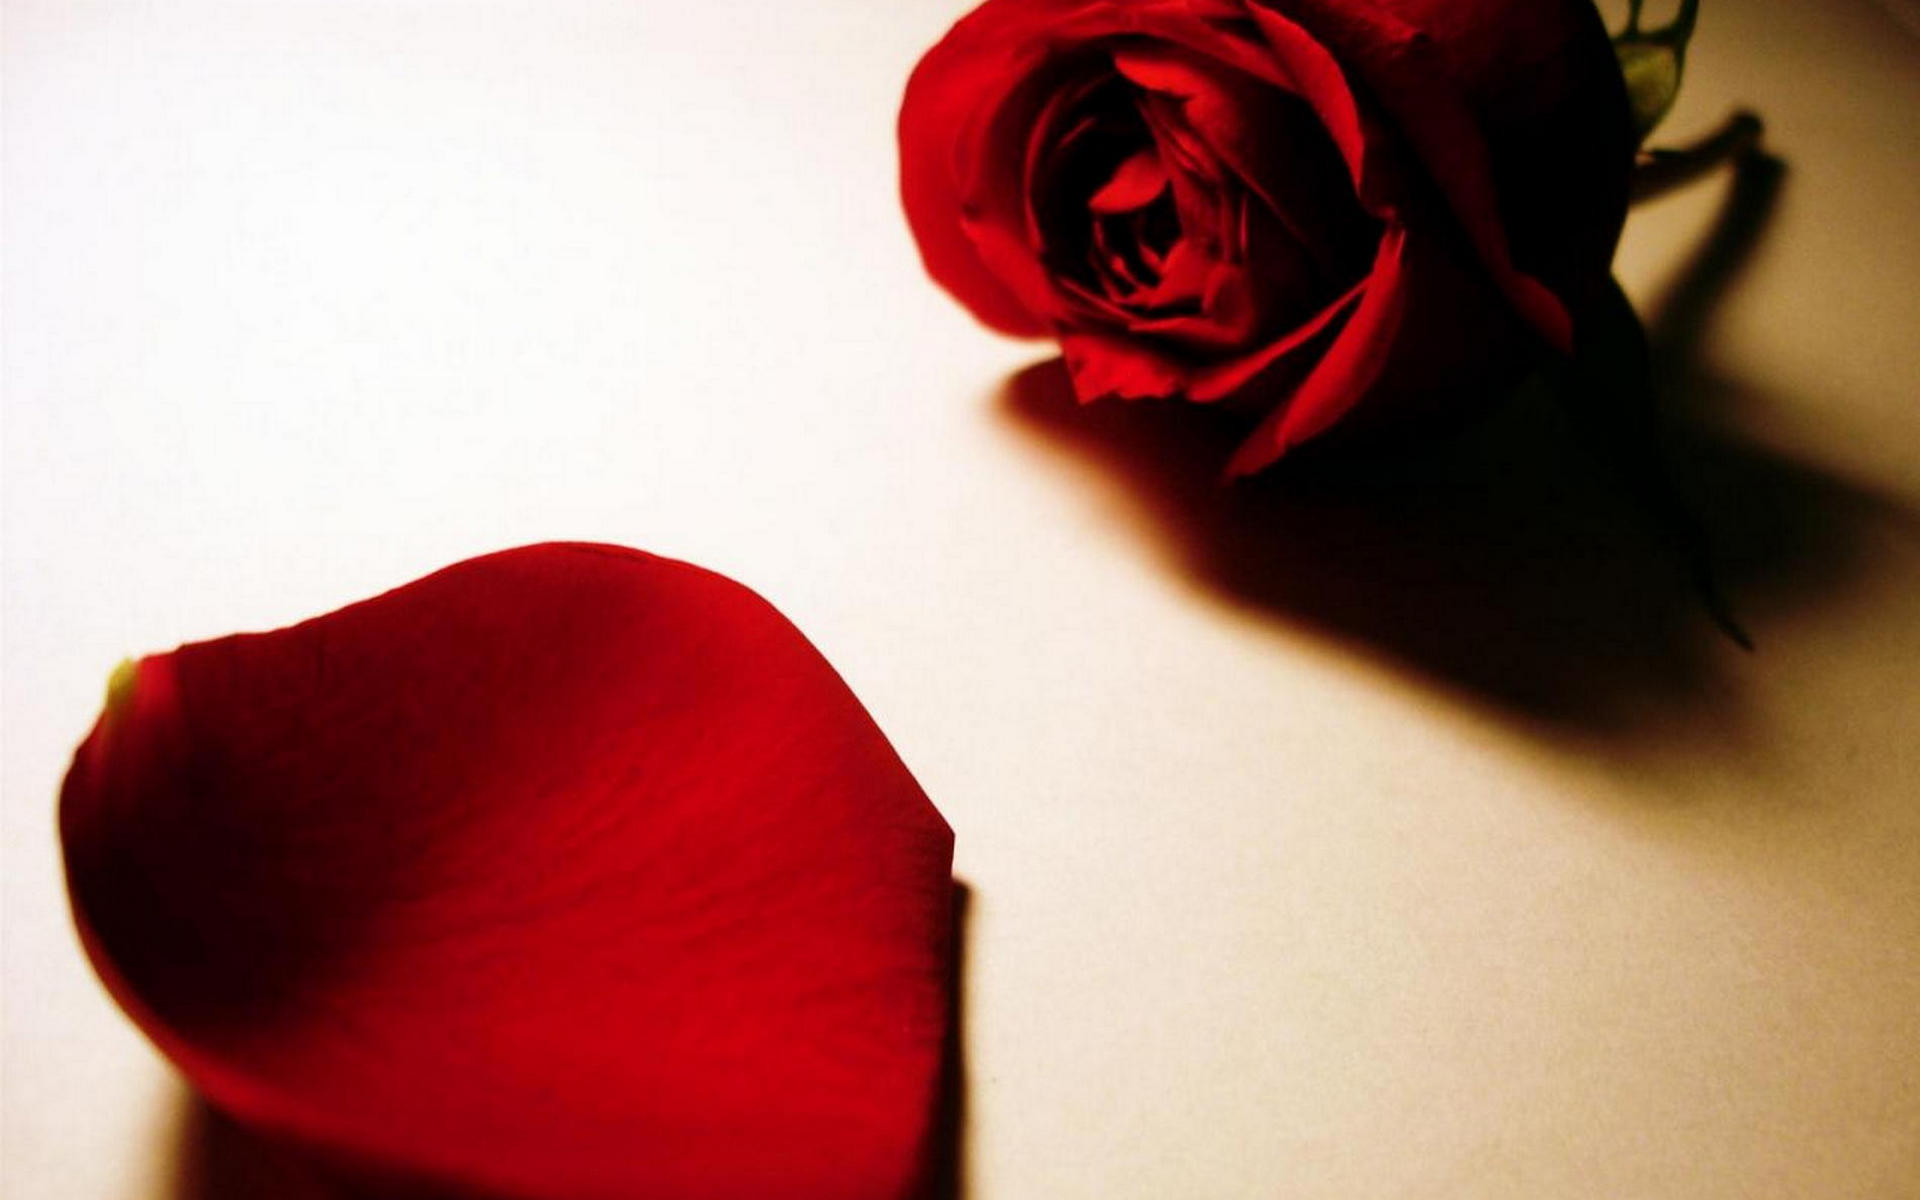 Роза, красная, лепестки, свет, тень ...: fonwall.ru/wallpaper/roza-krasnaya-lepestki-svet.html